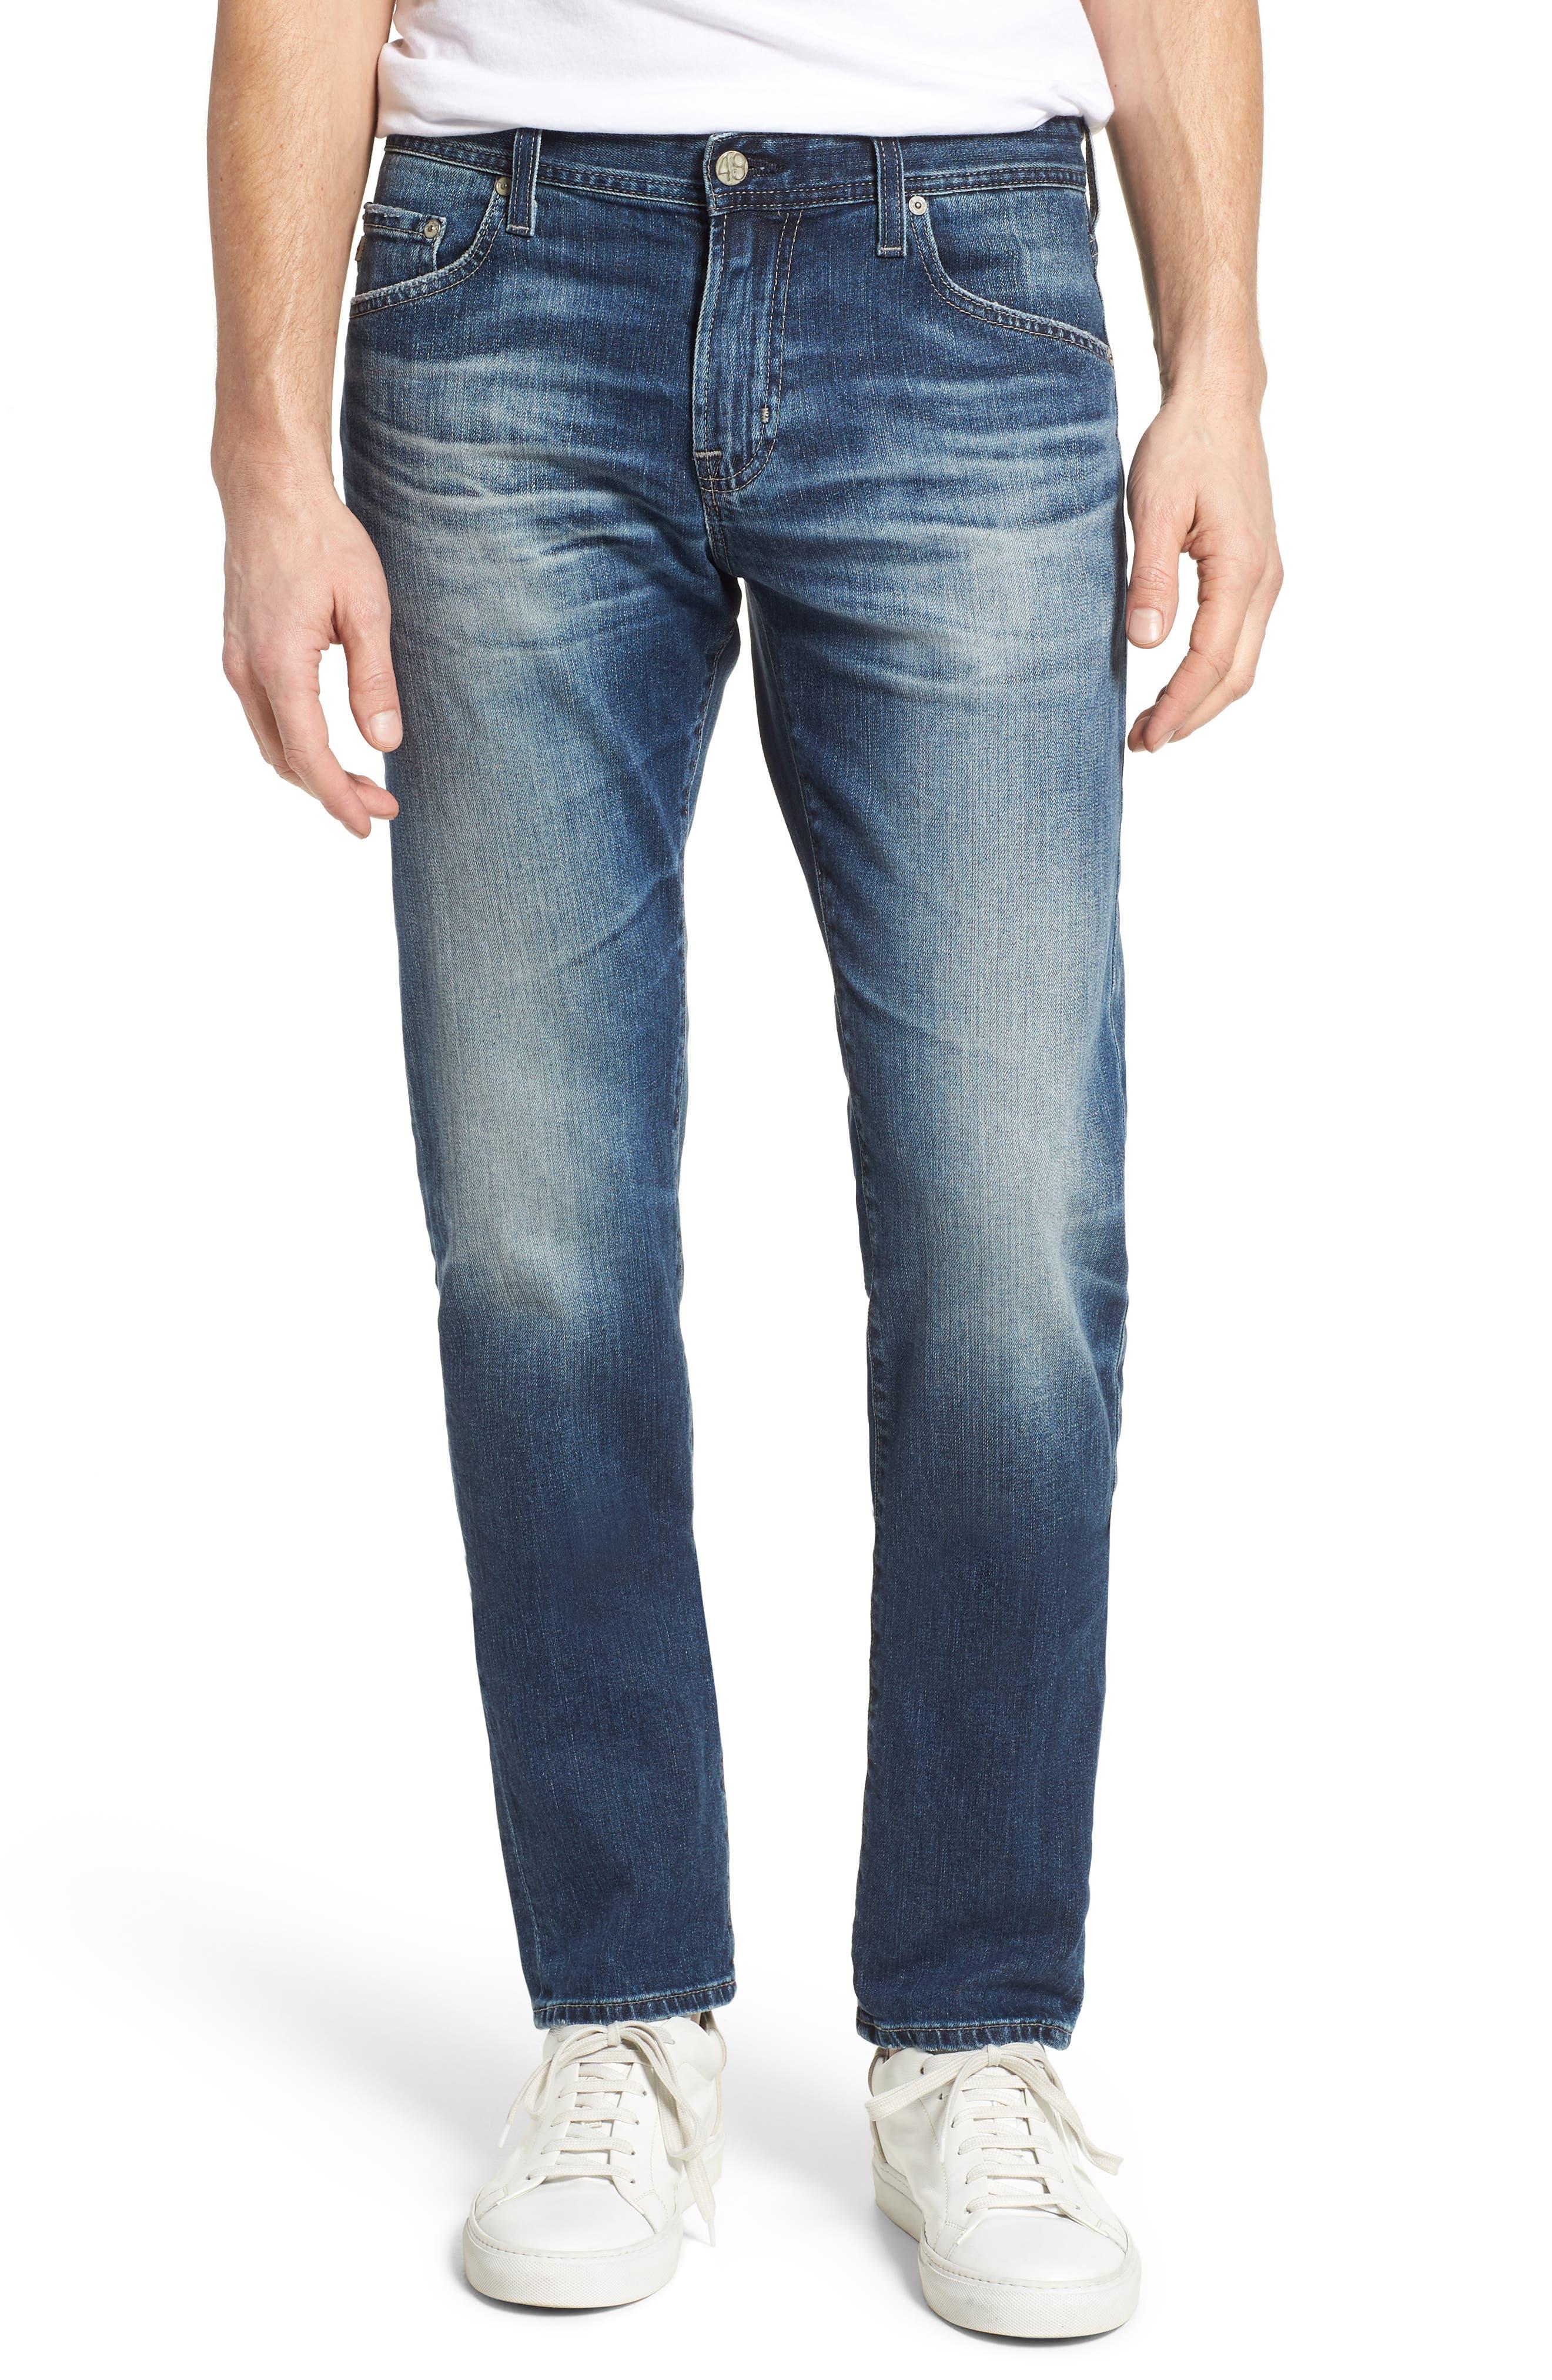 Tellis Slim Fit Jeans,                         Main,                         color, 12 Years Mavericks